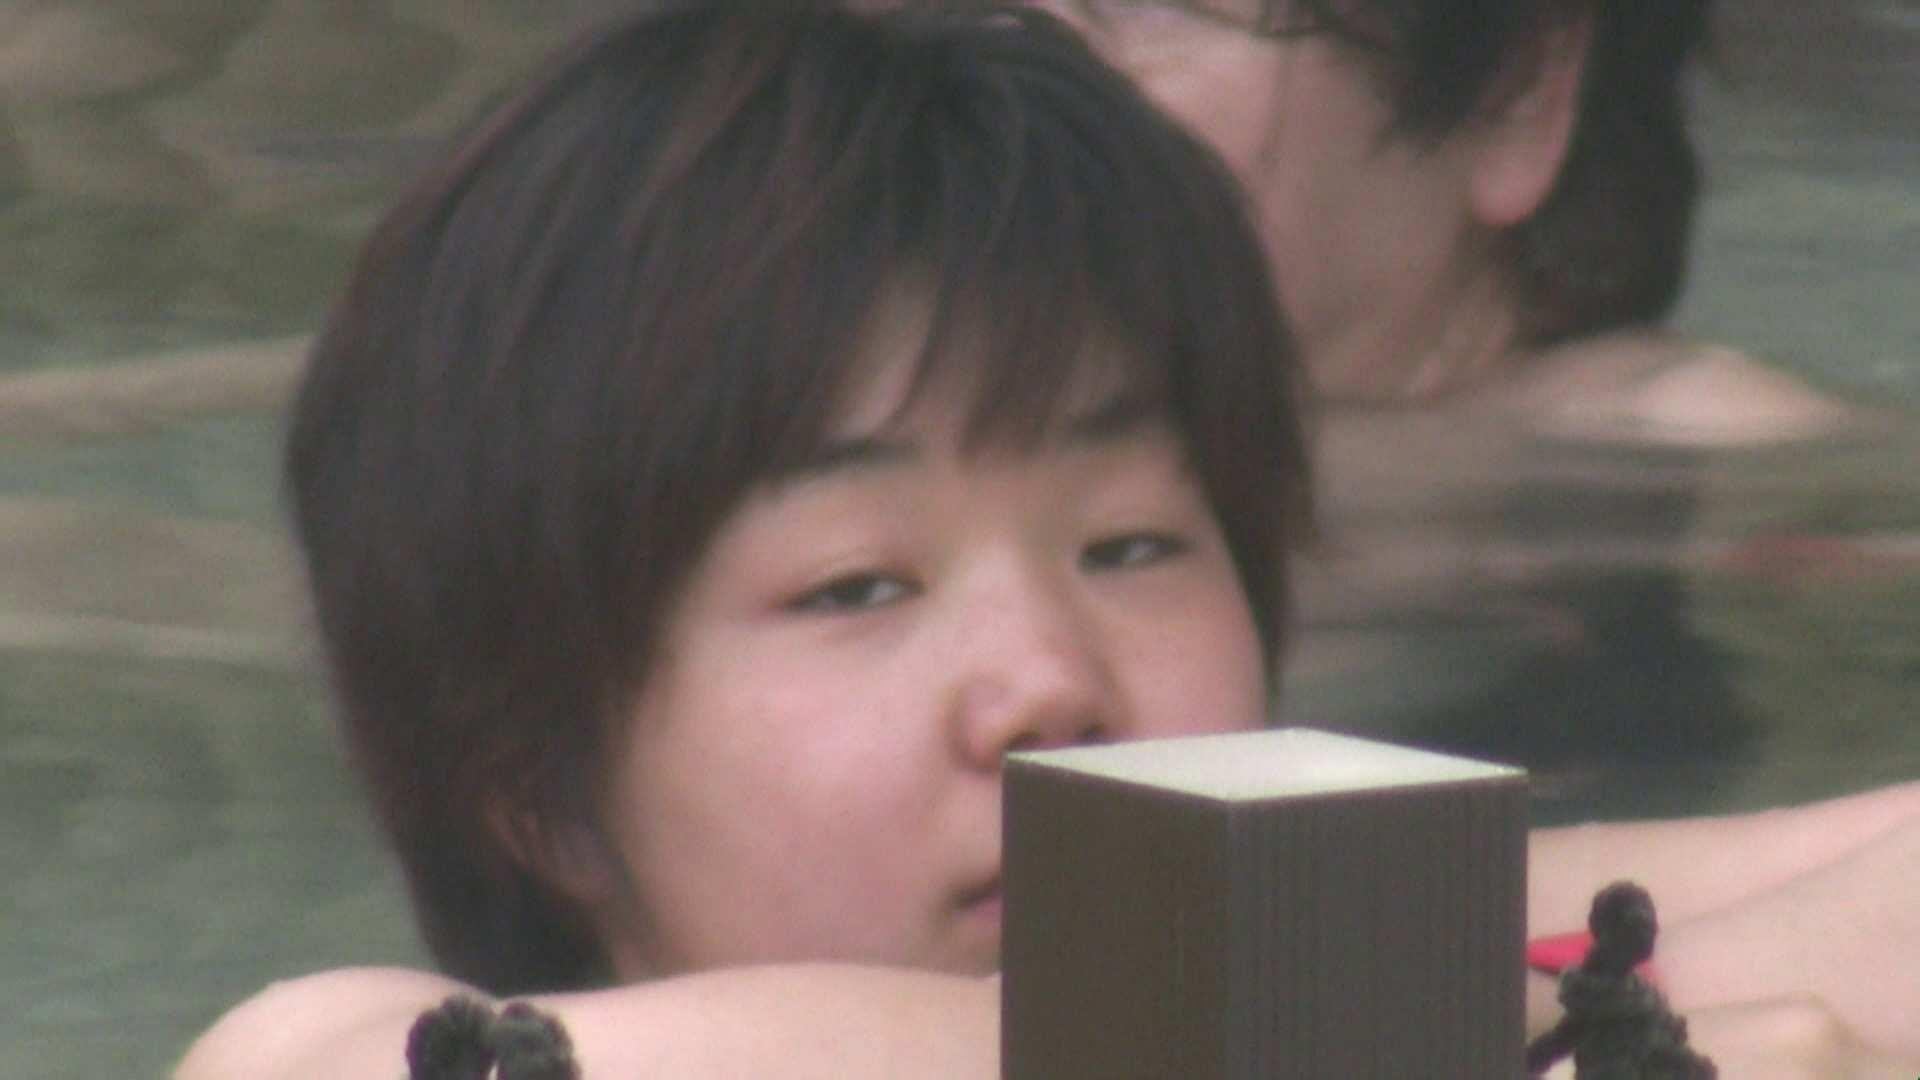 Aquaな露天風呂Vol.53【VIP限定】 女体盗撮  93連発 30